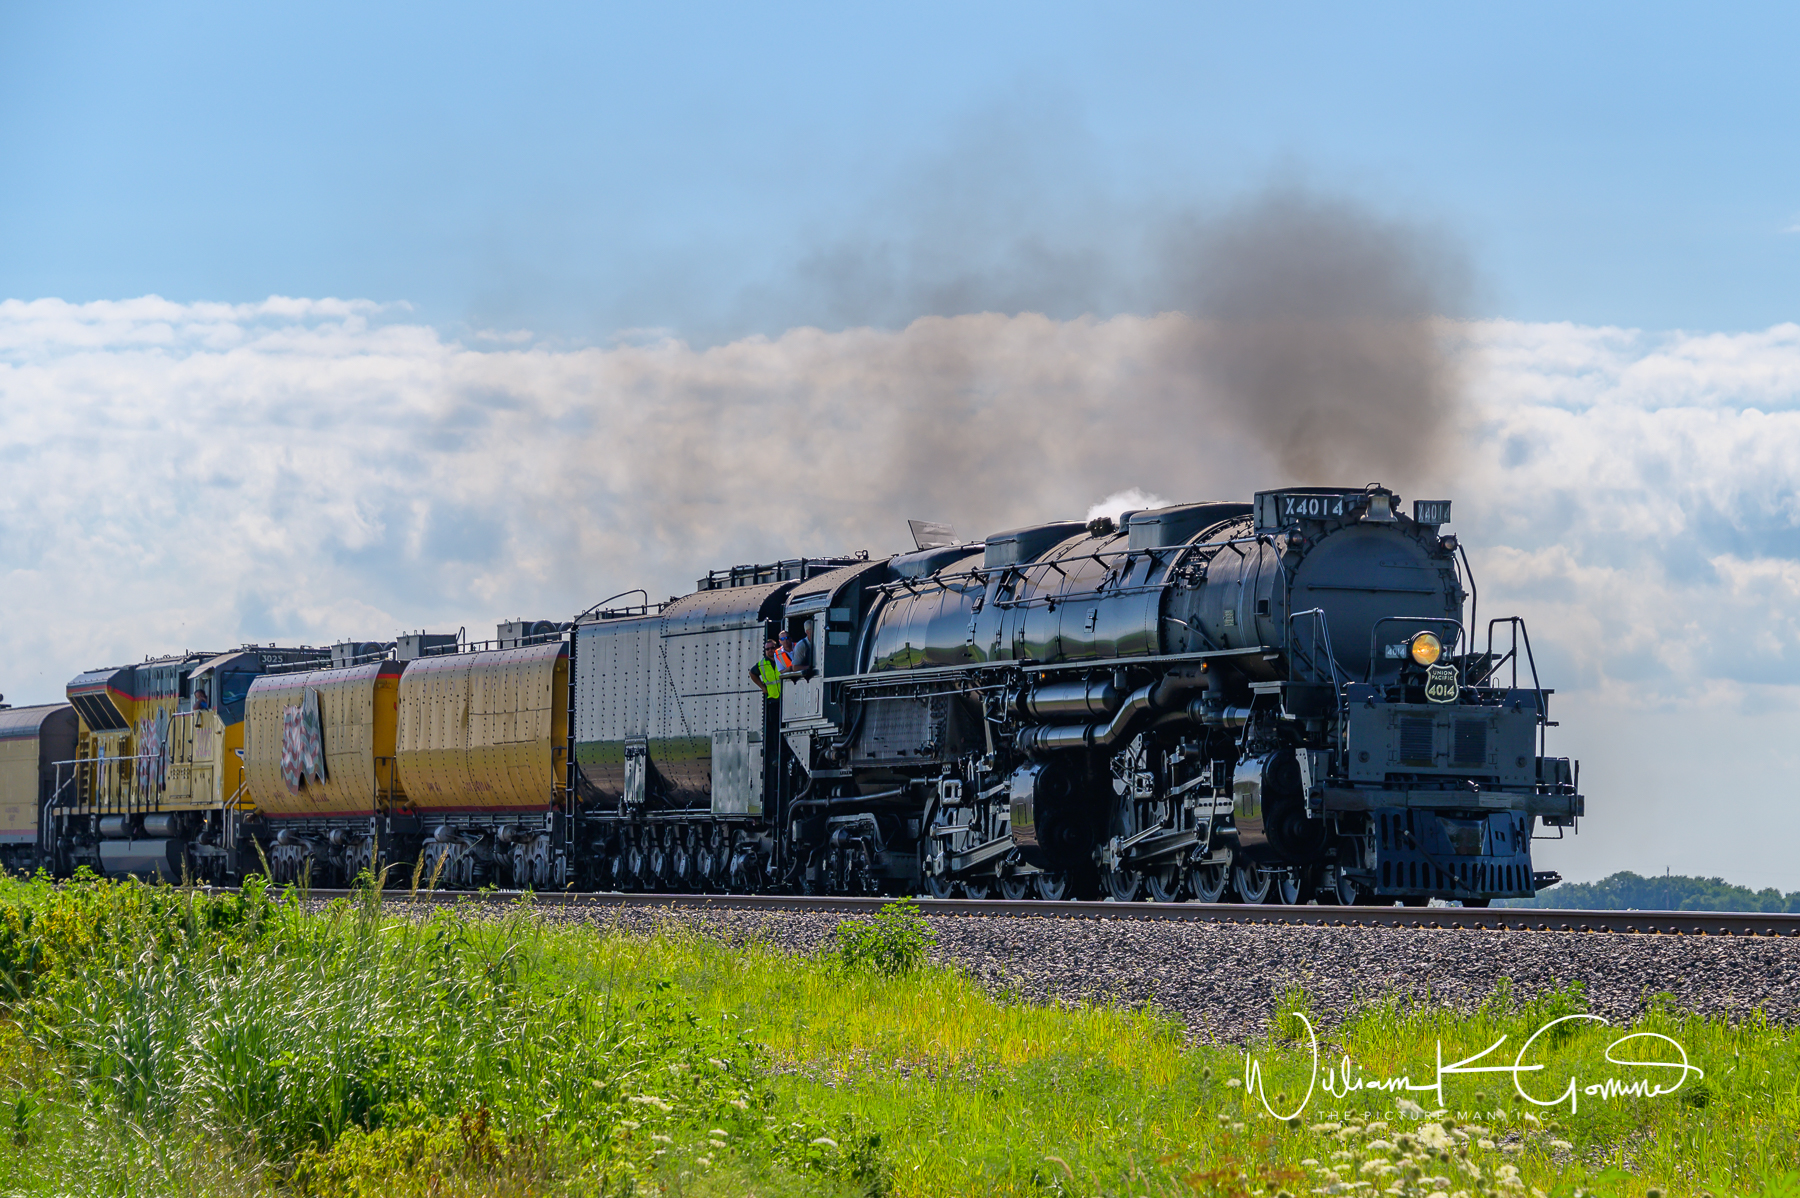 Big Boy 4014 rolling into Malta, Illinois in DeKalb County.